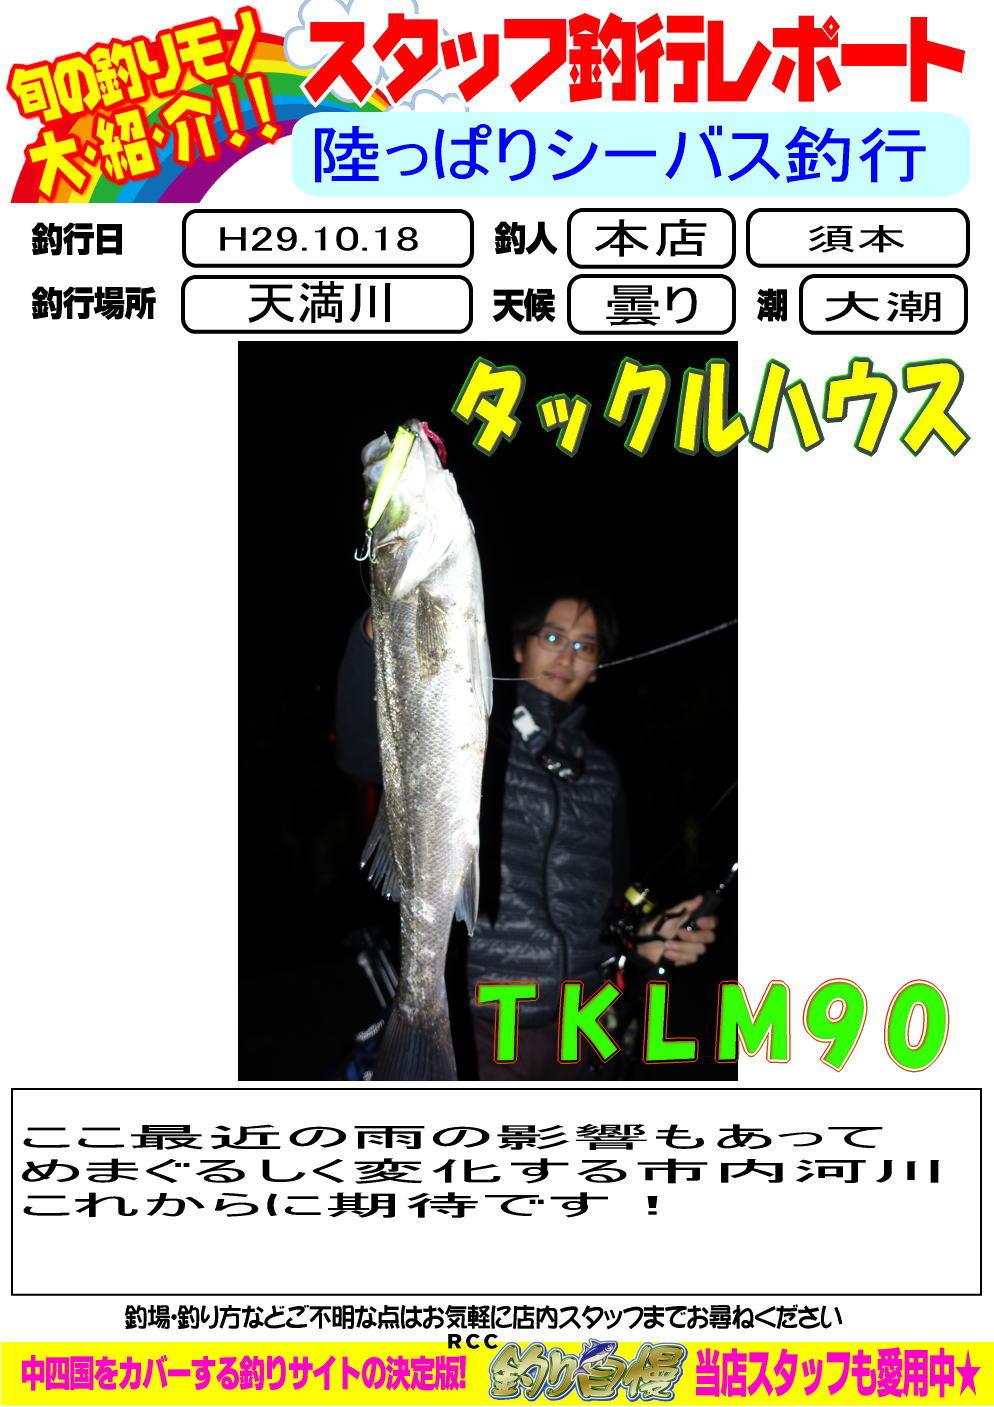 http://www.e-angle.co.jp/shop/blog/H29.10.22.jpg